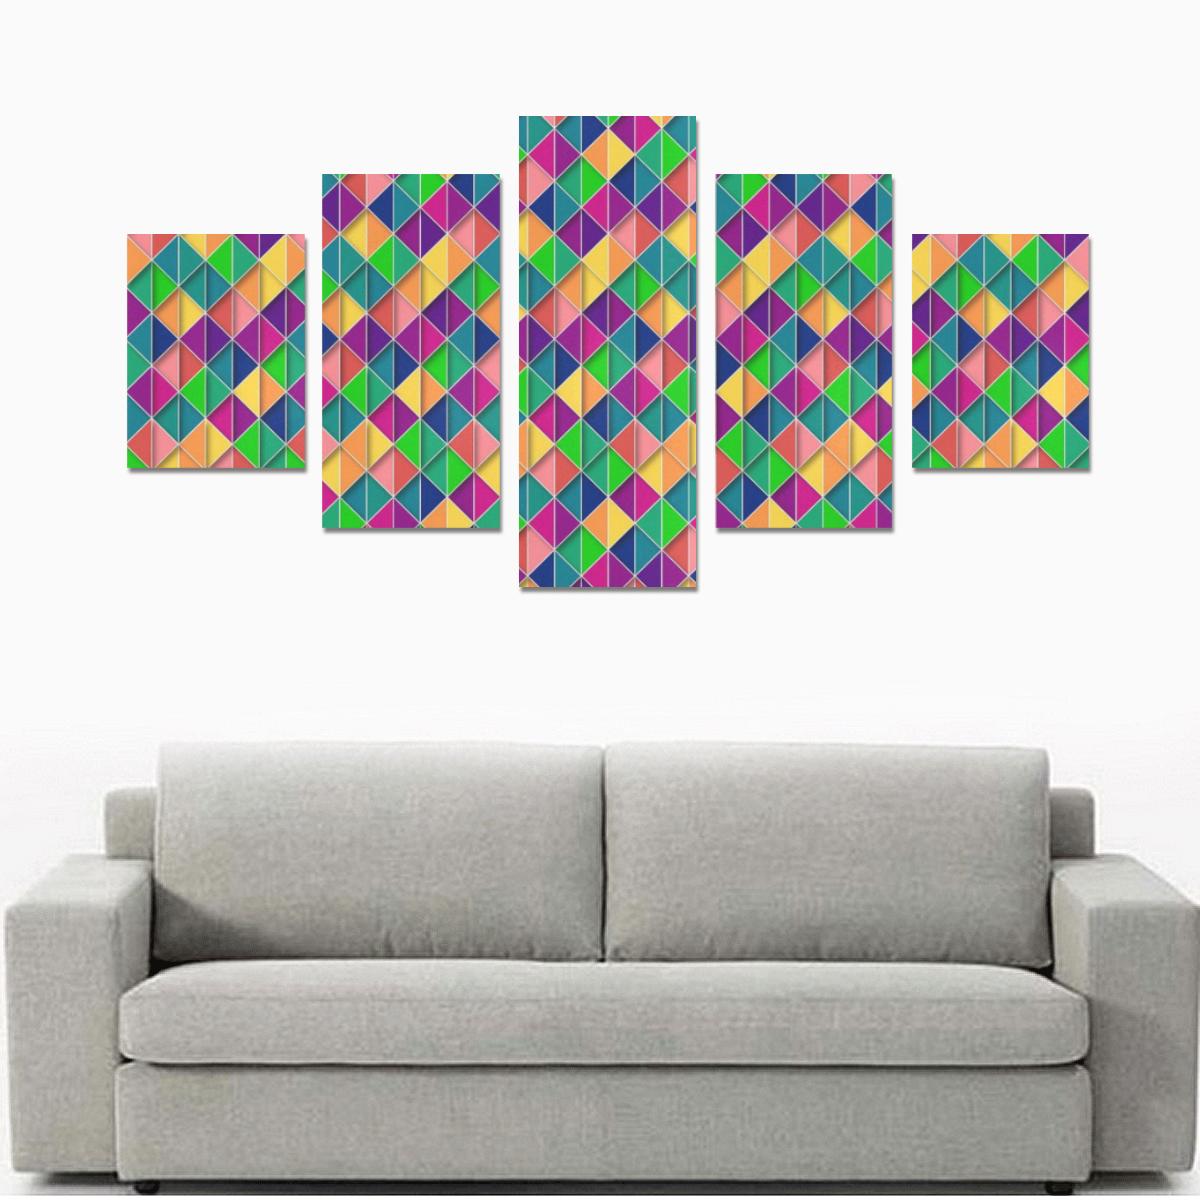 Geometric Abstract Triangle Canvas Print Sets B (No Frame)